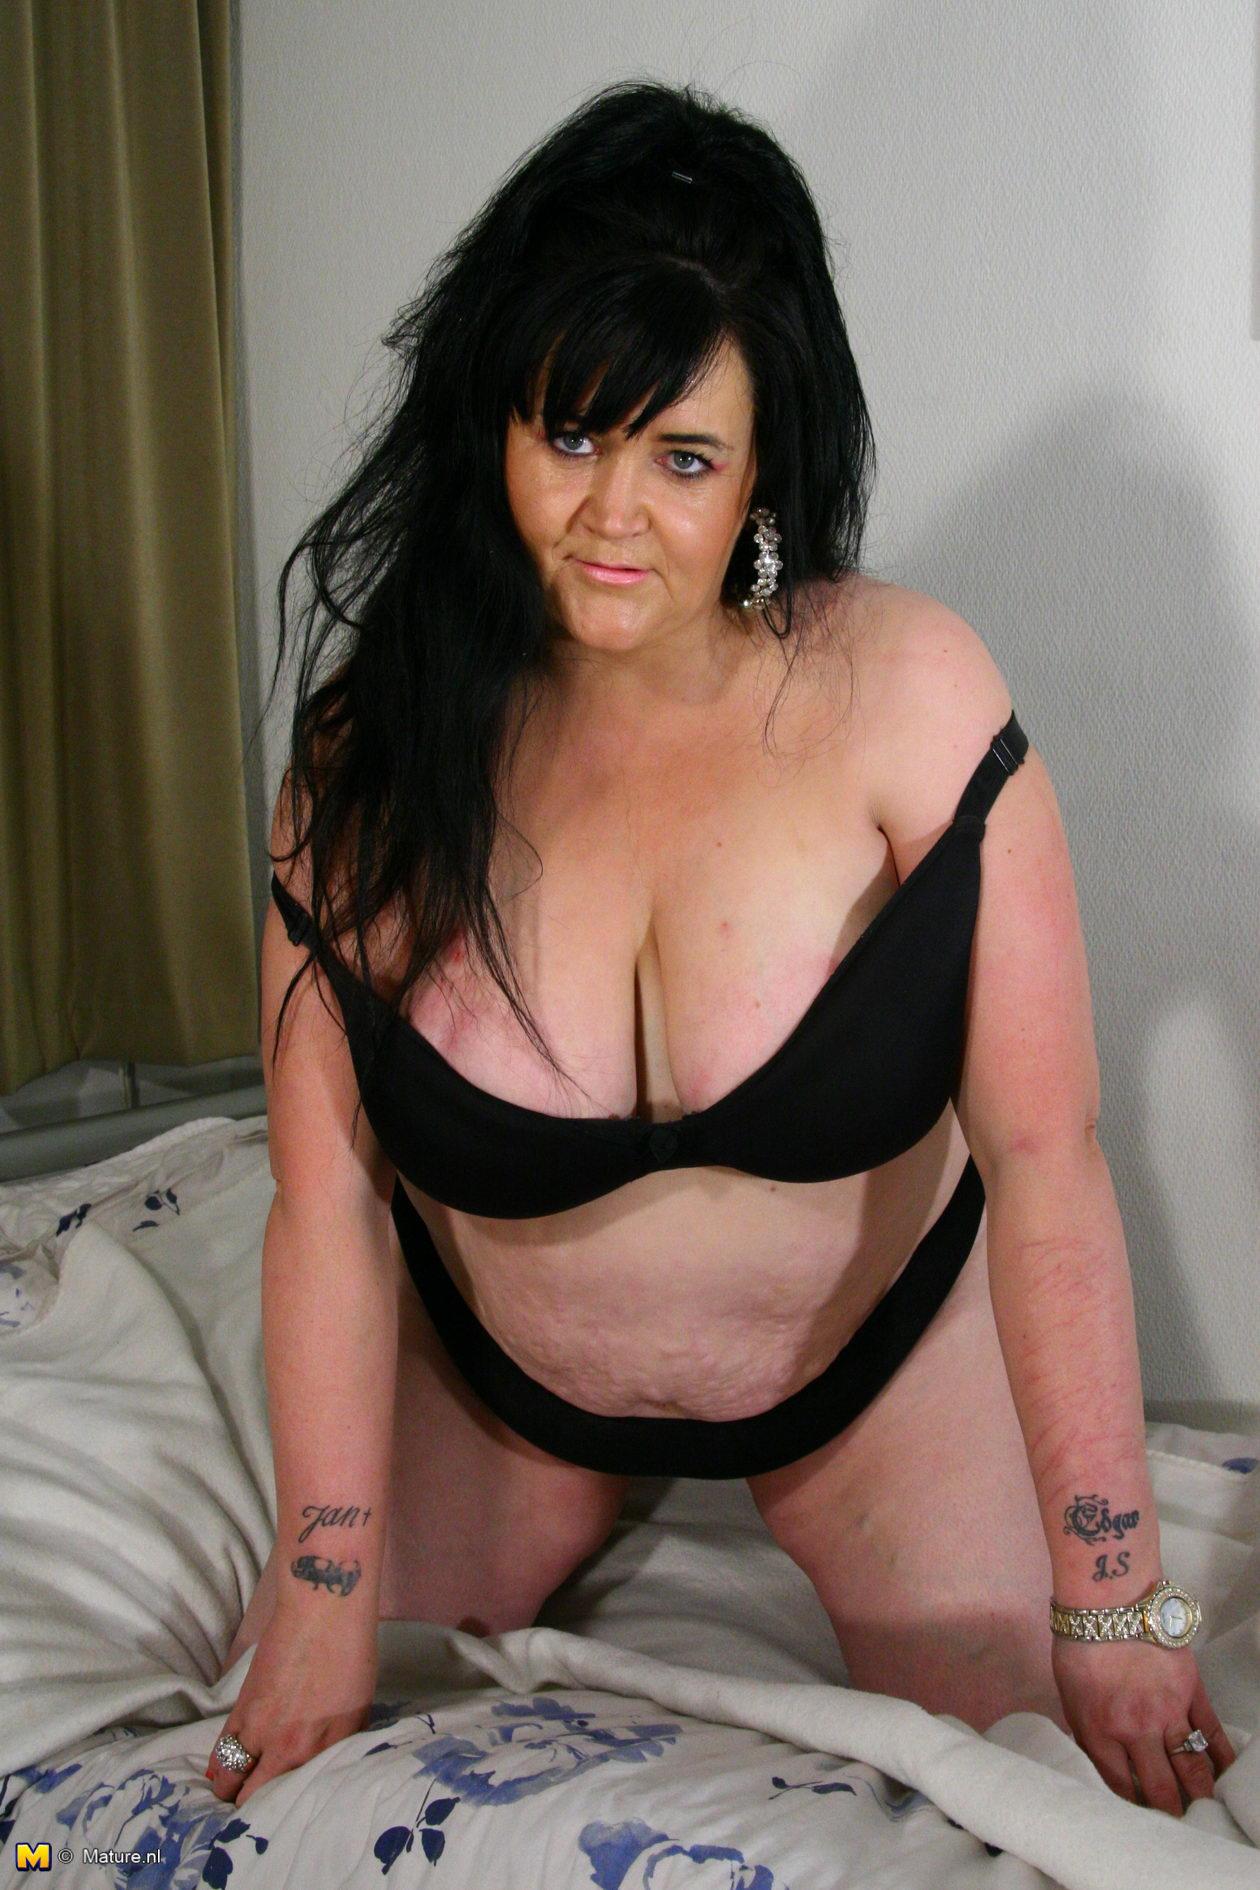 Big tits playing on webcam 2 7